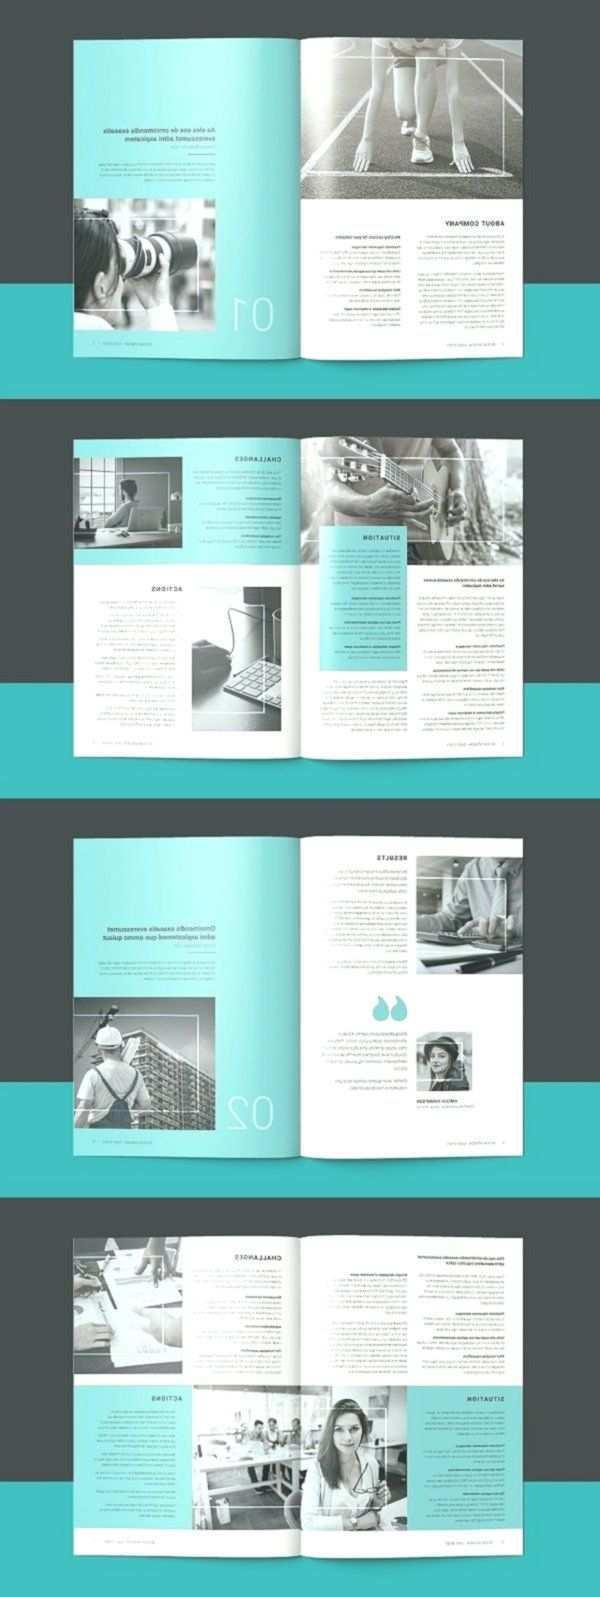 Fallstudie Broschuren Vorlage Broschure Vorlage Broschuren Indesign Te Book Design Layout Booklet Template Brochure Layout